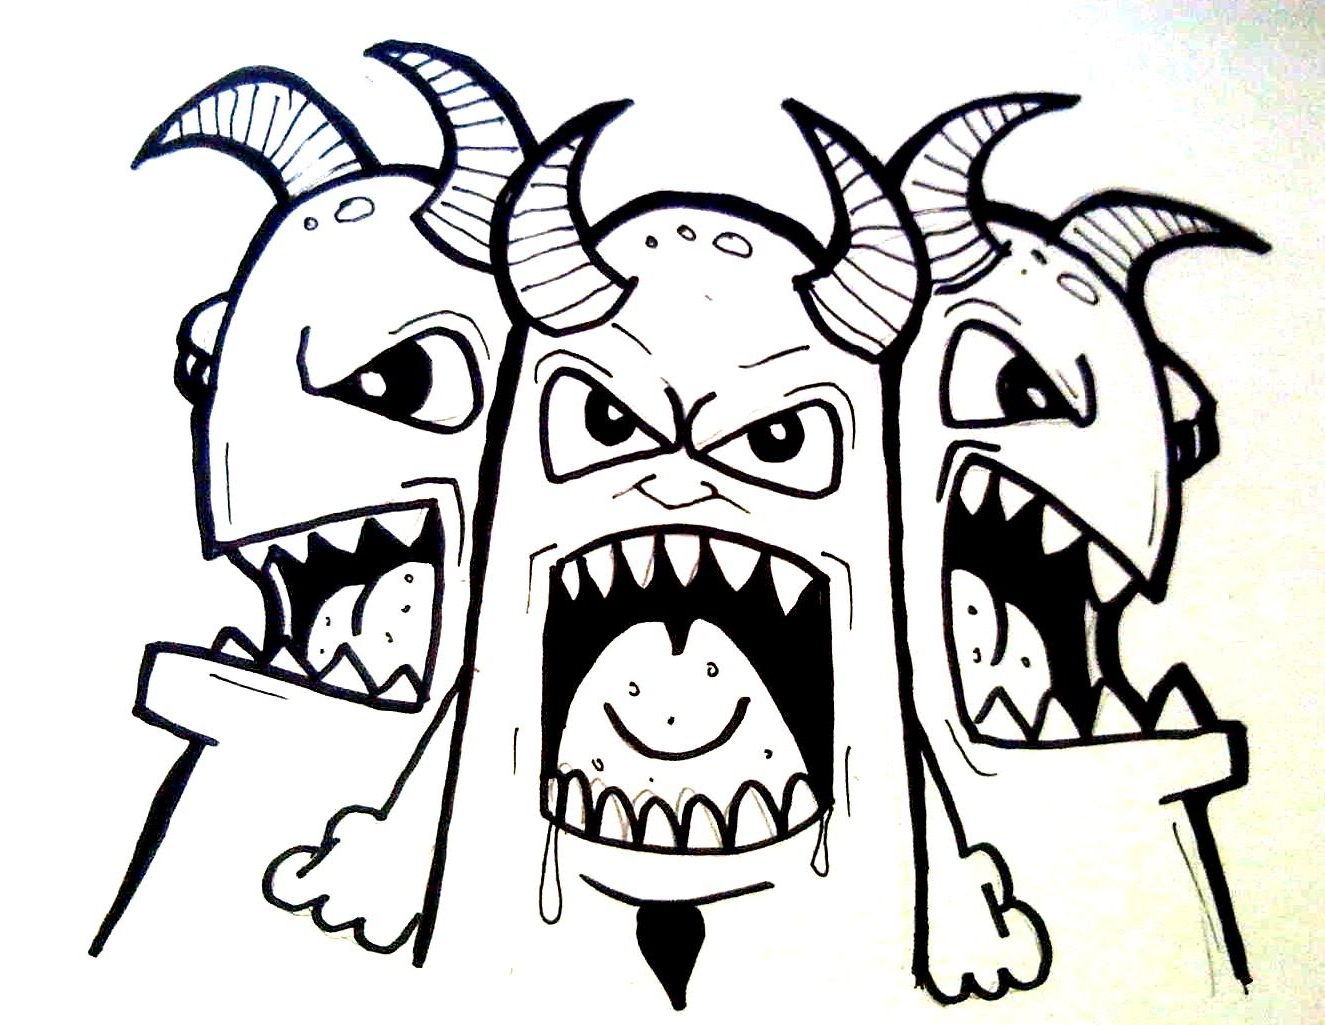 1325x1025 Graffiti Character Monster Sketch 3d How To Draw 3 Graffiti